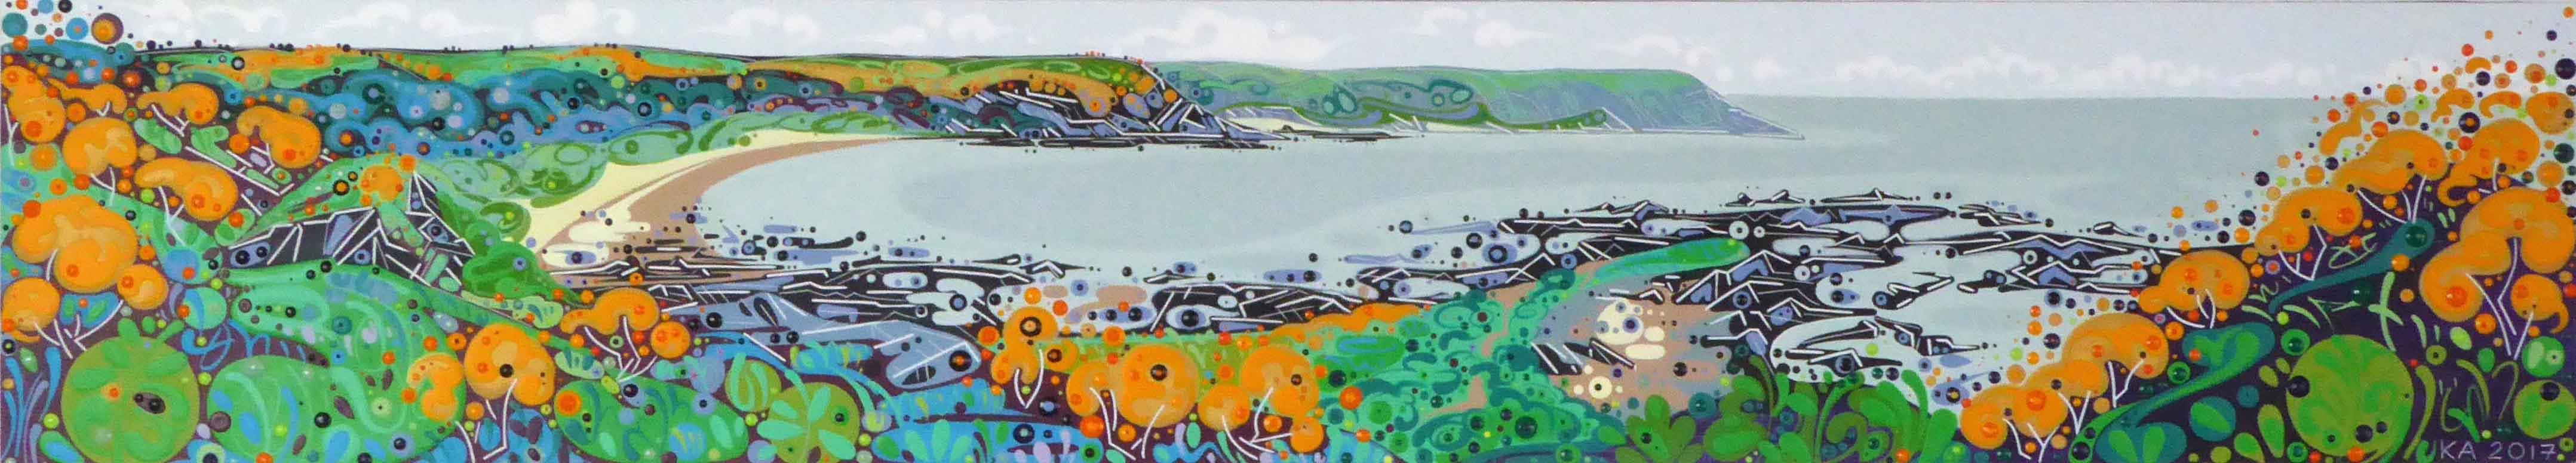 Gorse Cliffs, Port Eynon  |  100 x 18cm